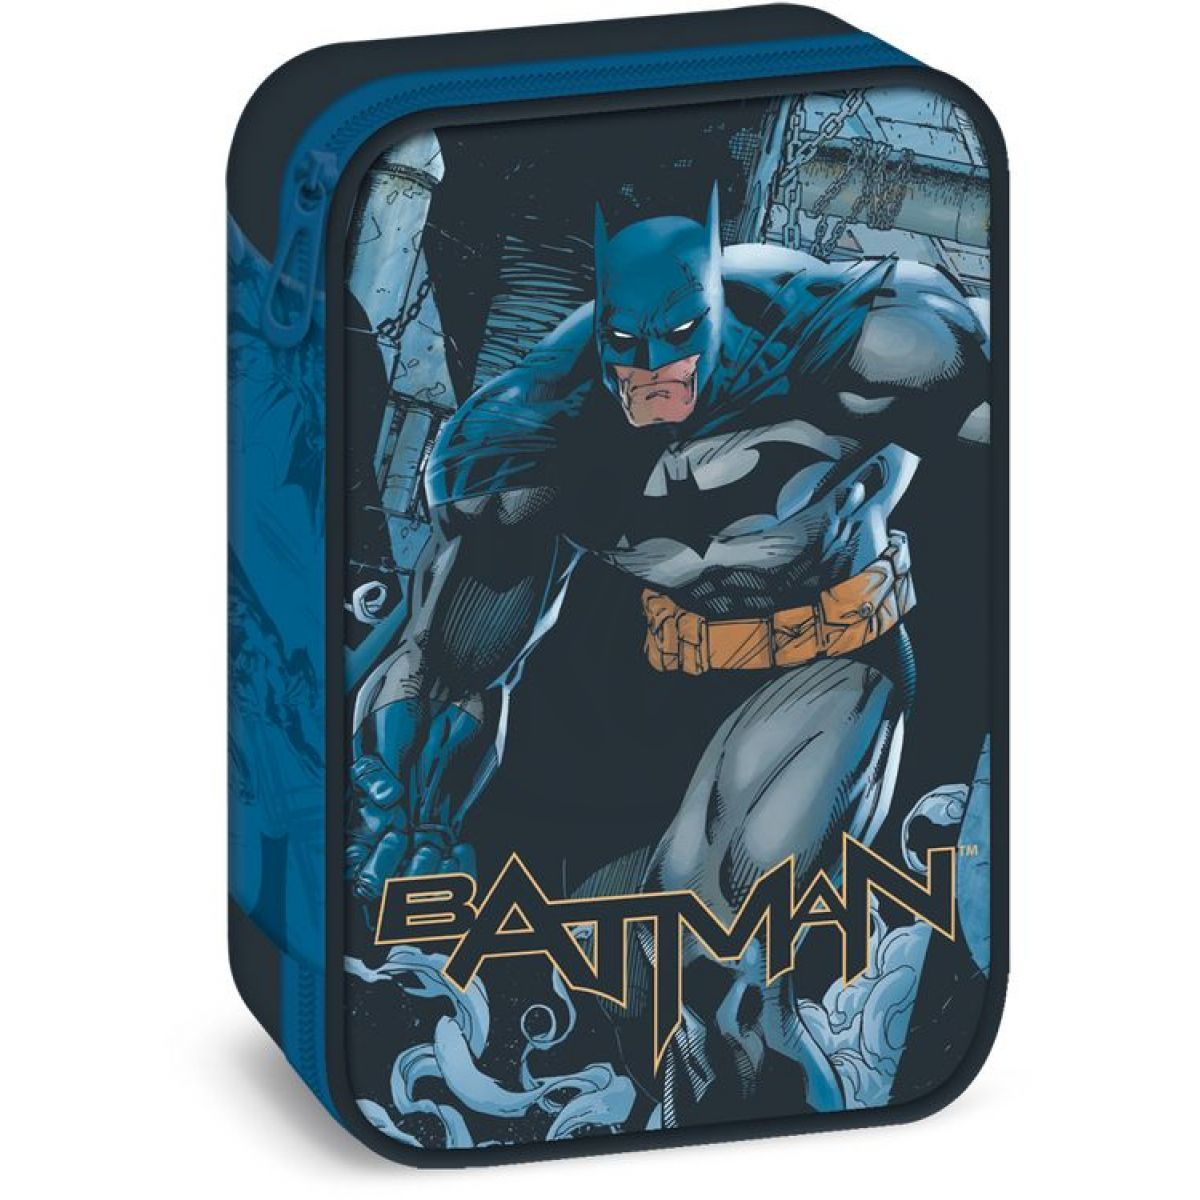 Batman superhero penal penal levně  93133779f1